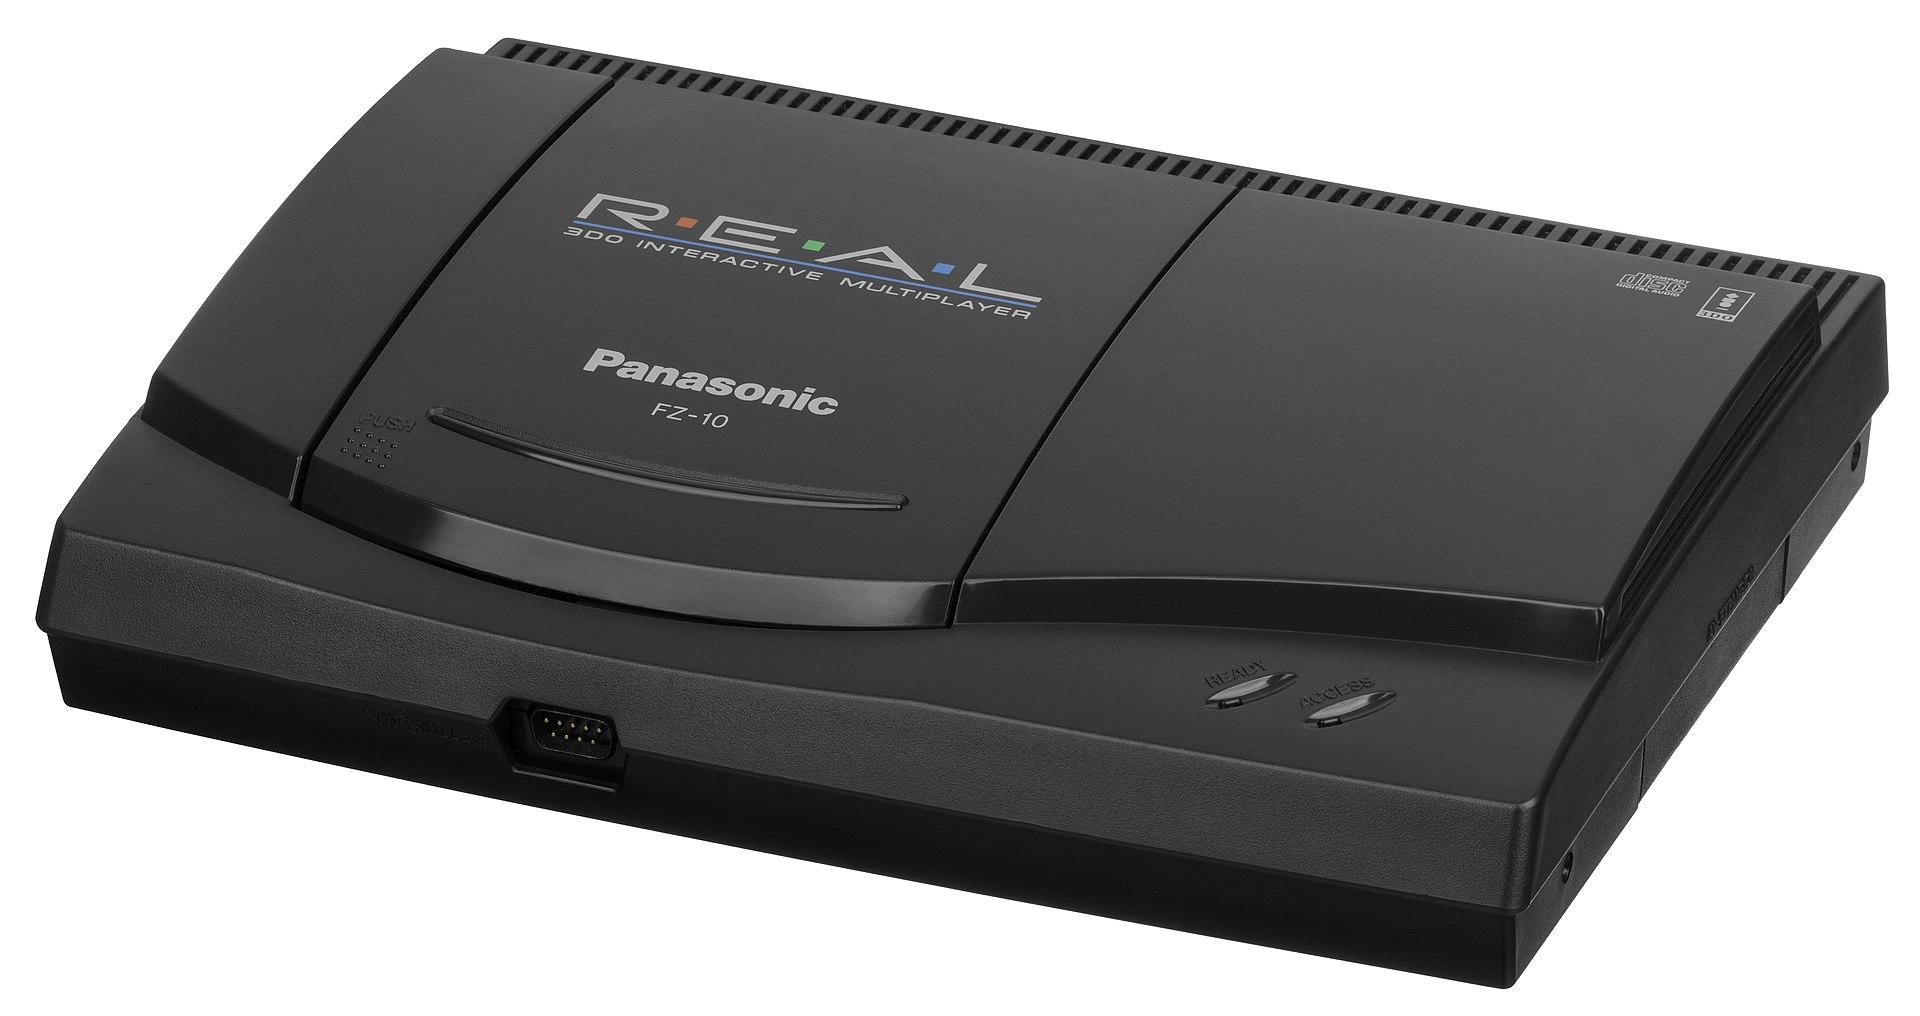 3DO Interactive Multiplayer - Wikipedia